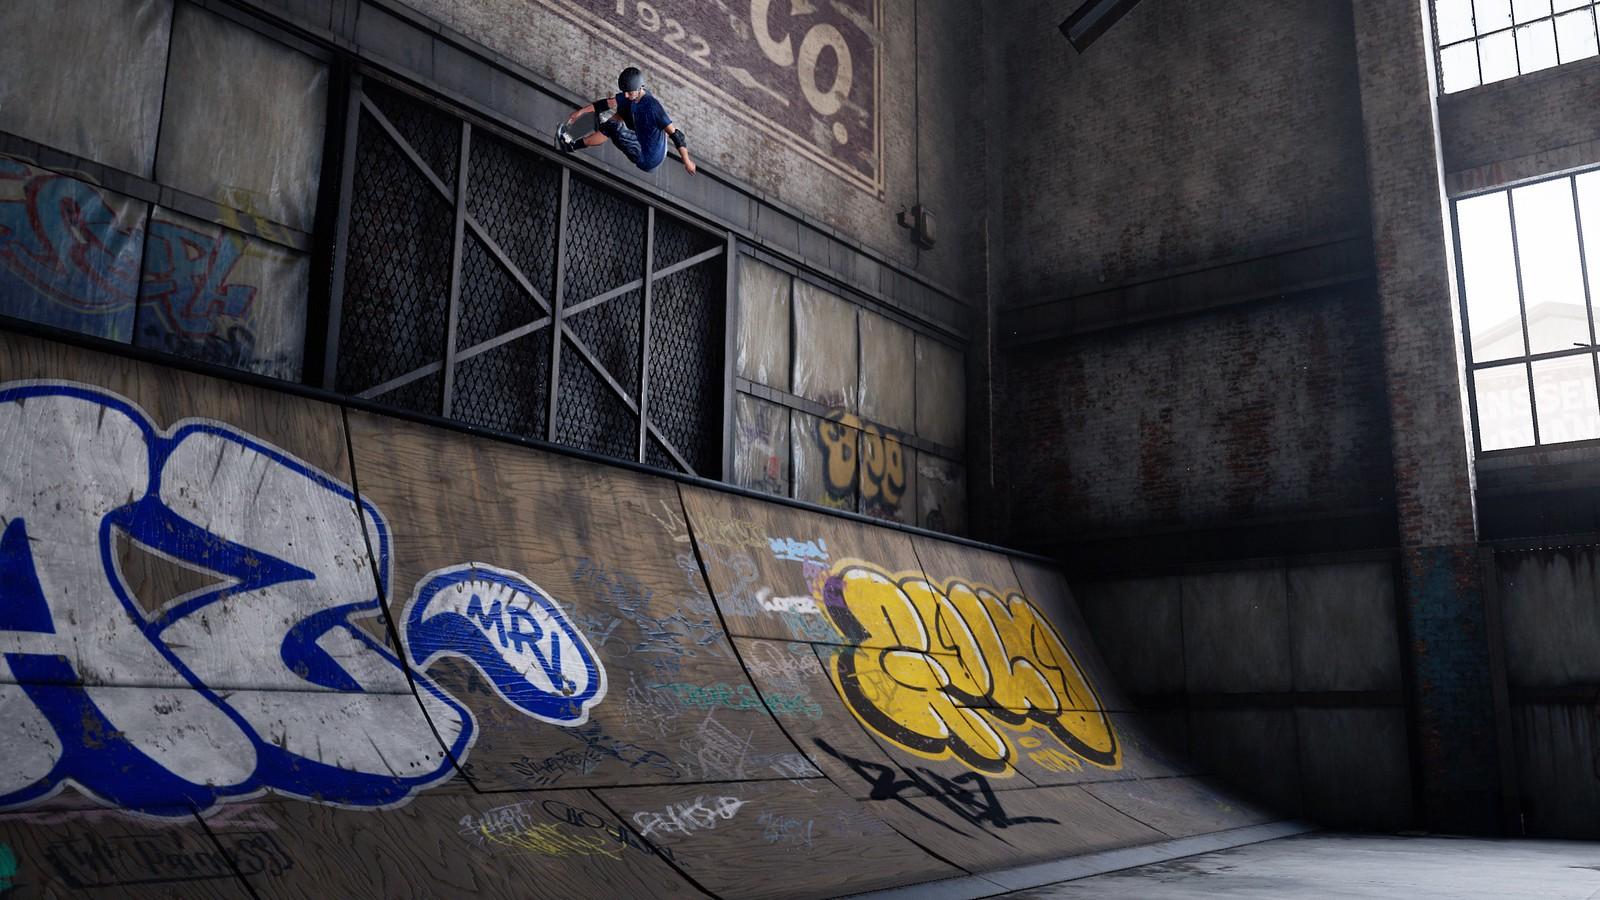 Tony Hawk Warehouse demo screenshots